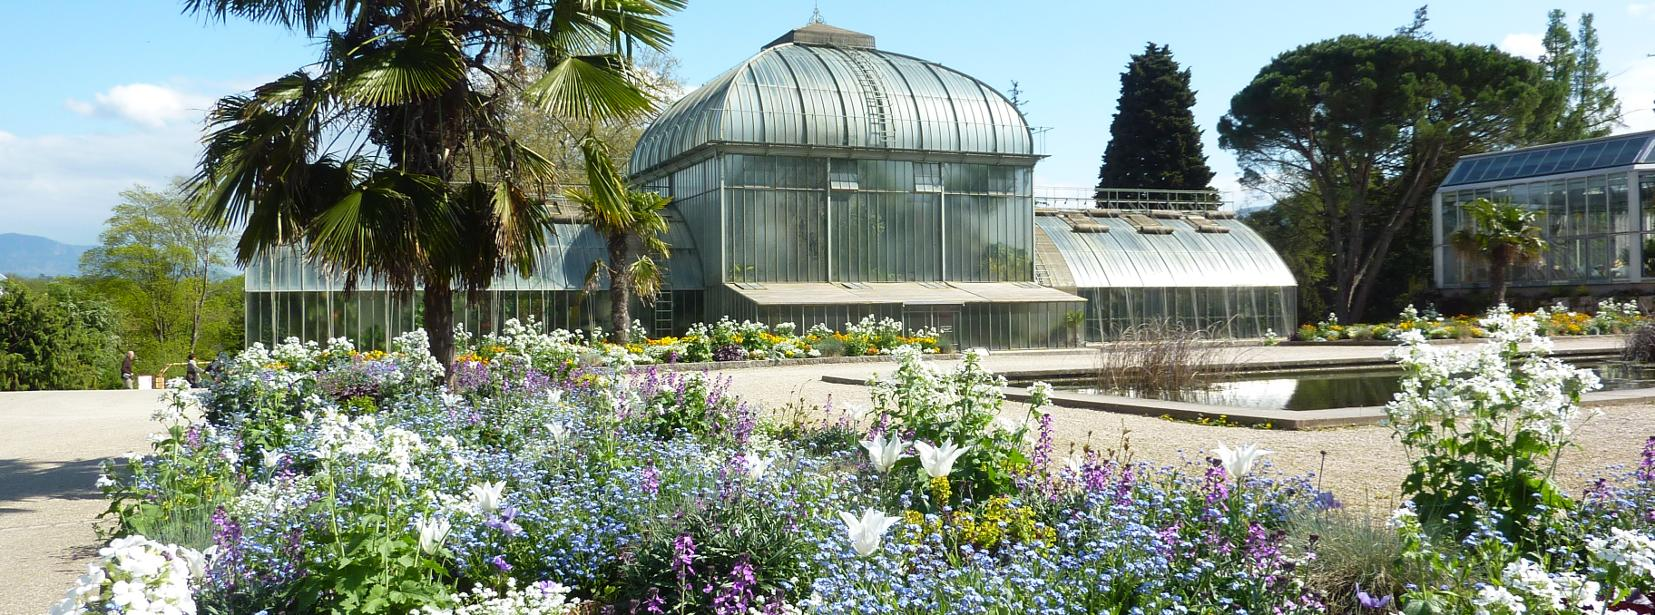 association des amis du jardin botanique - Jardin Botanique Geneve